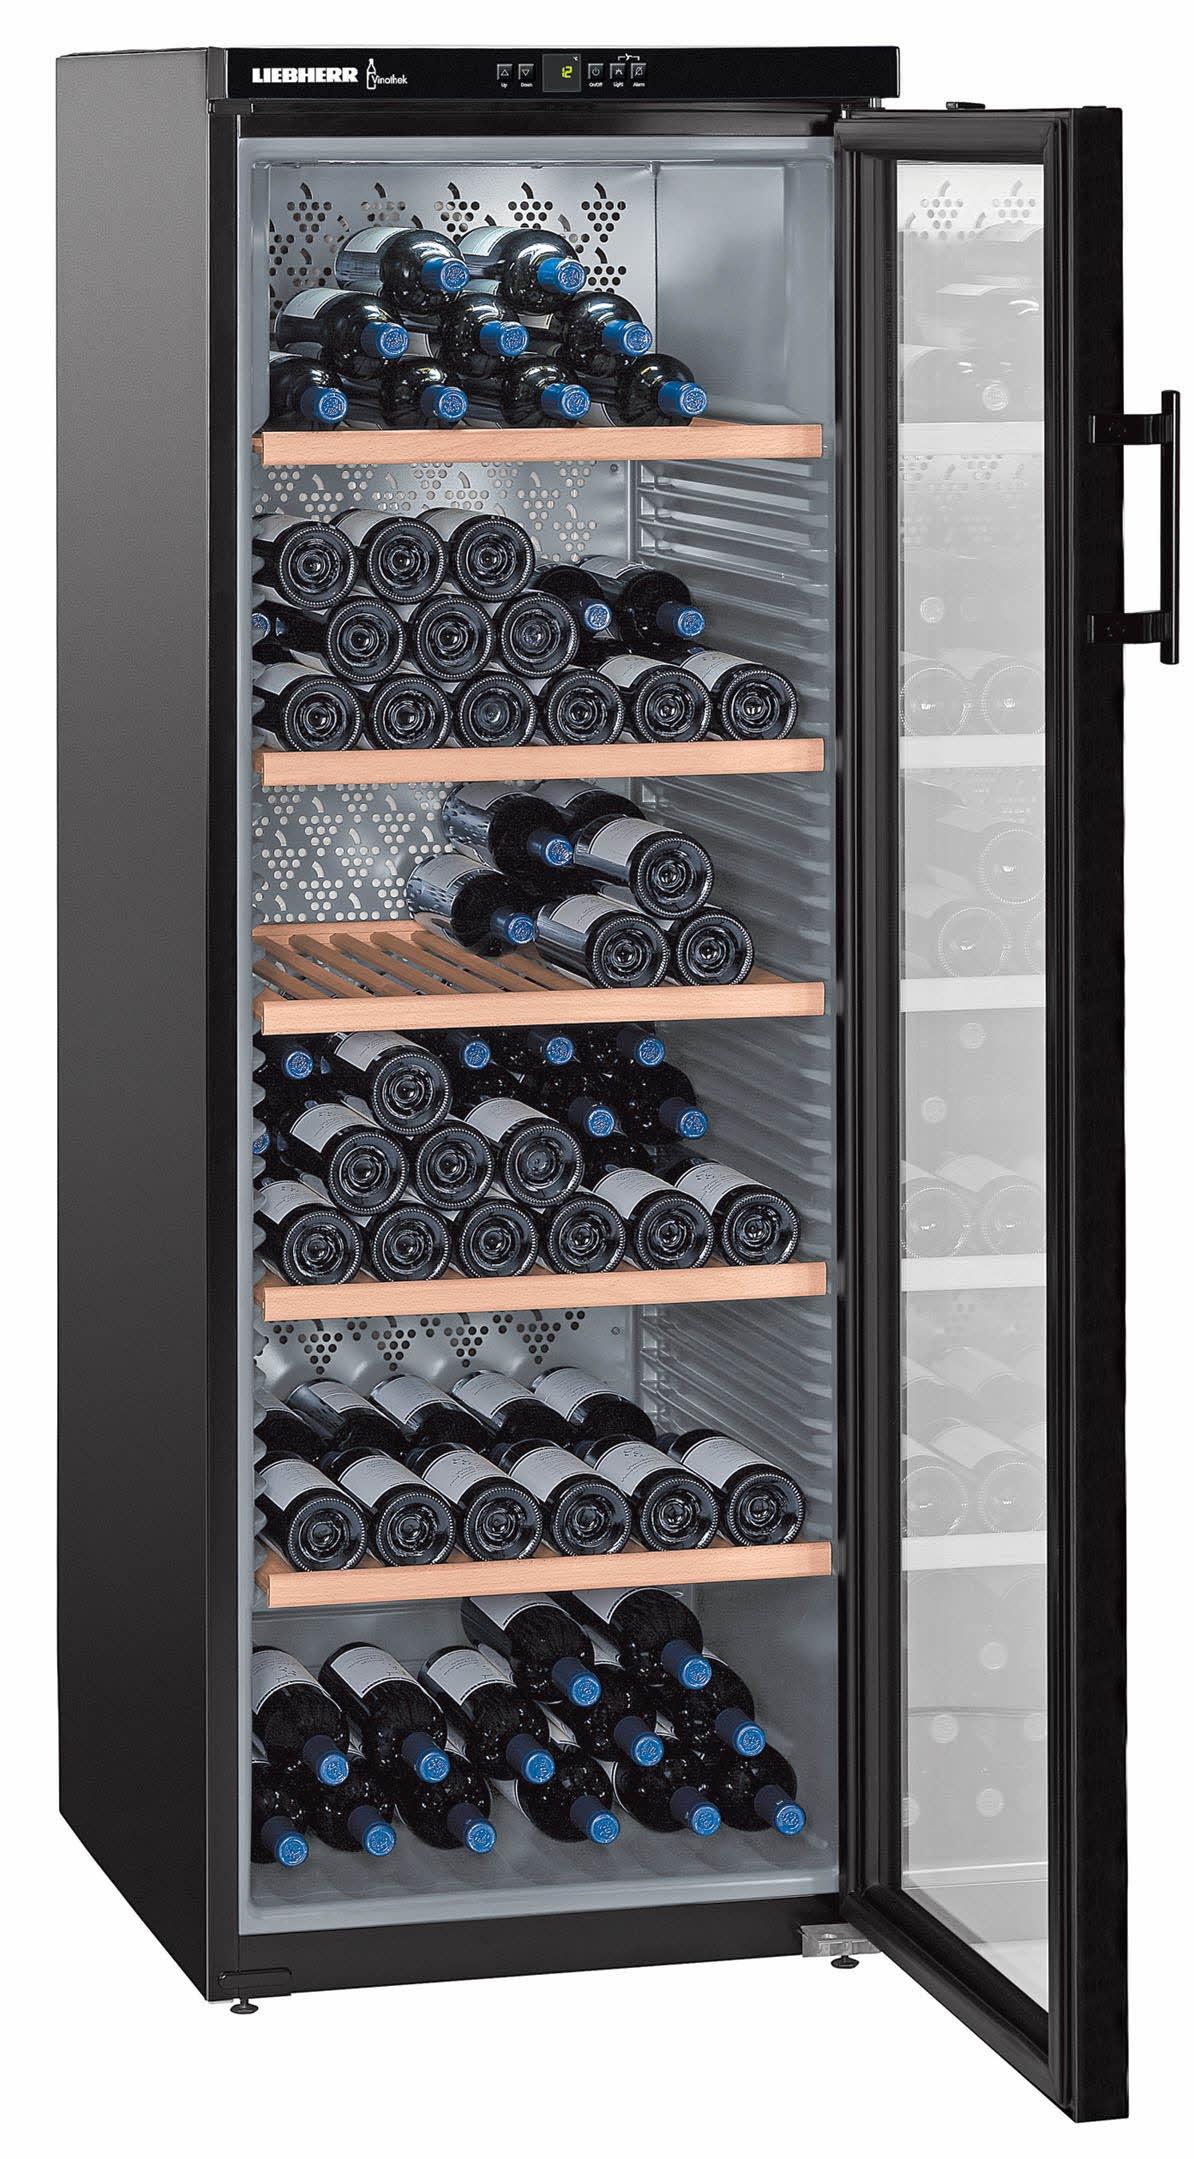 Liebherr WKb 4212-20 Wijnkoelkast